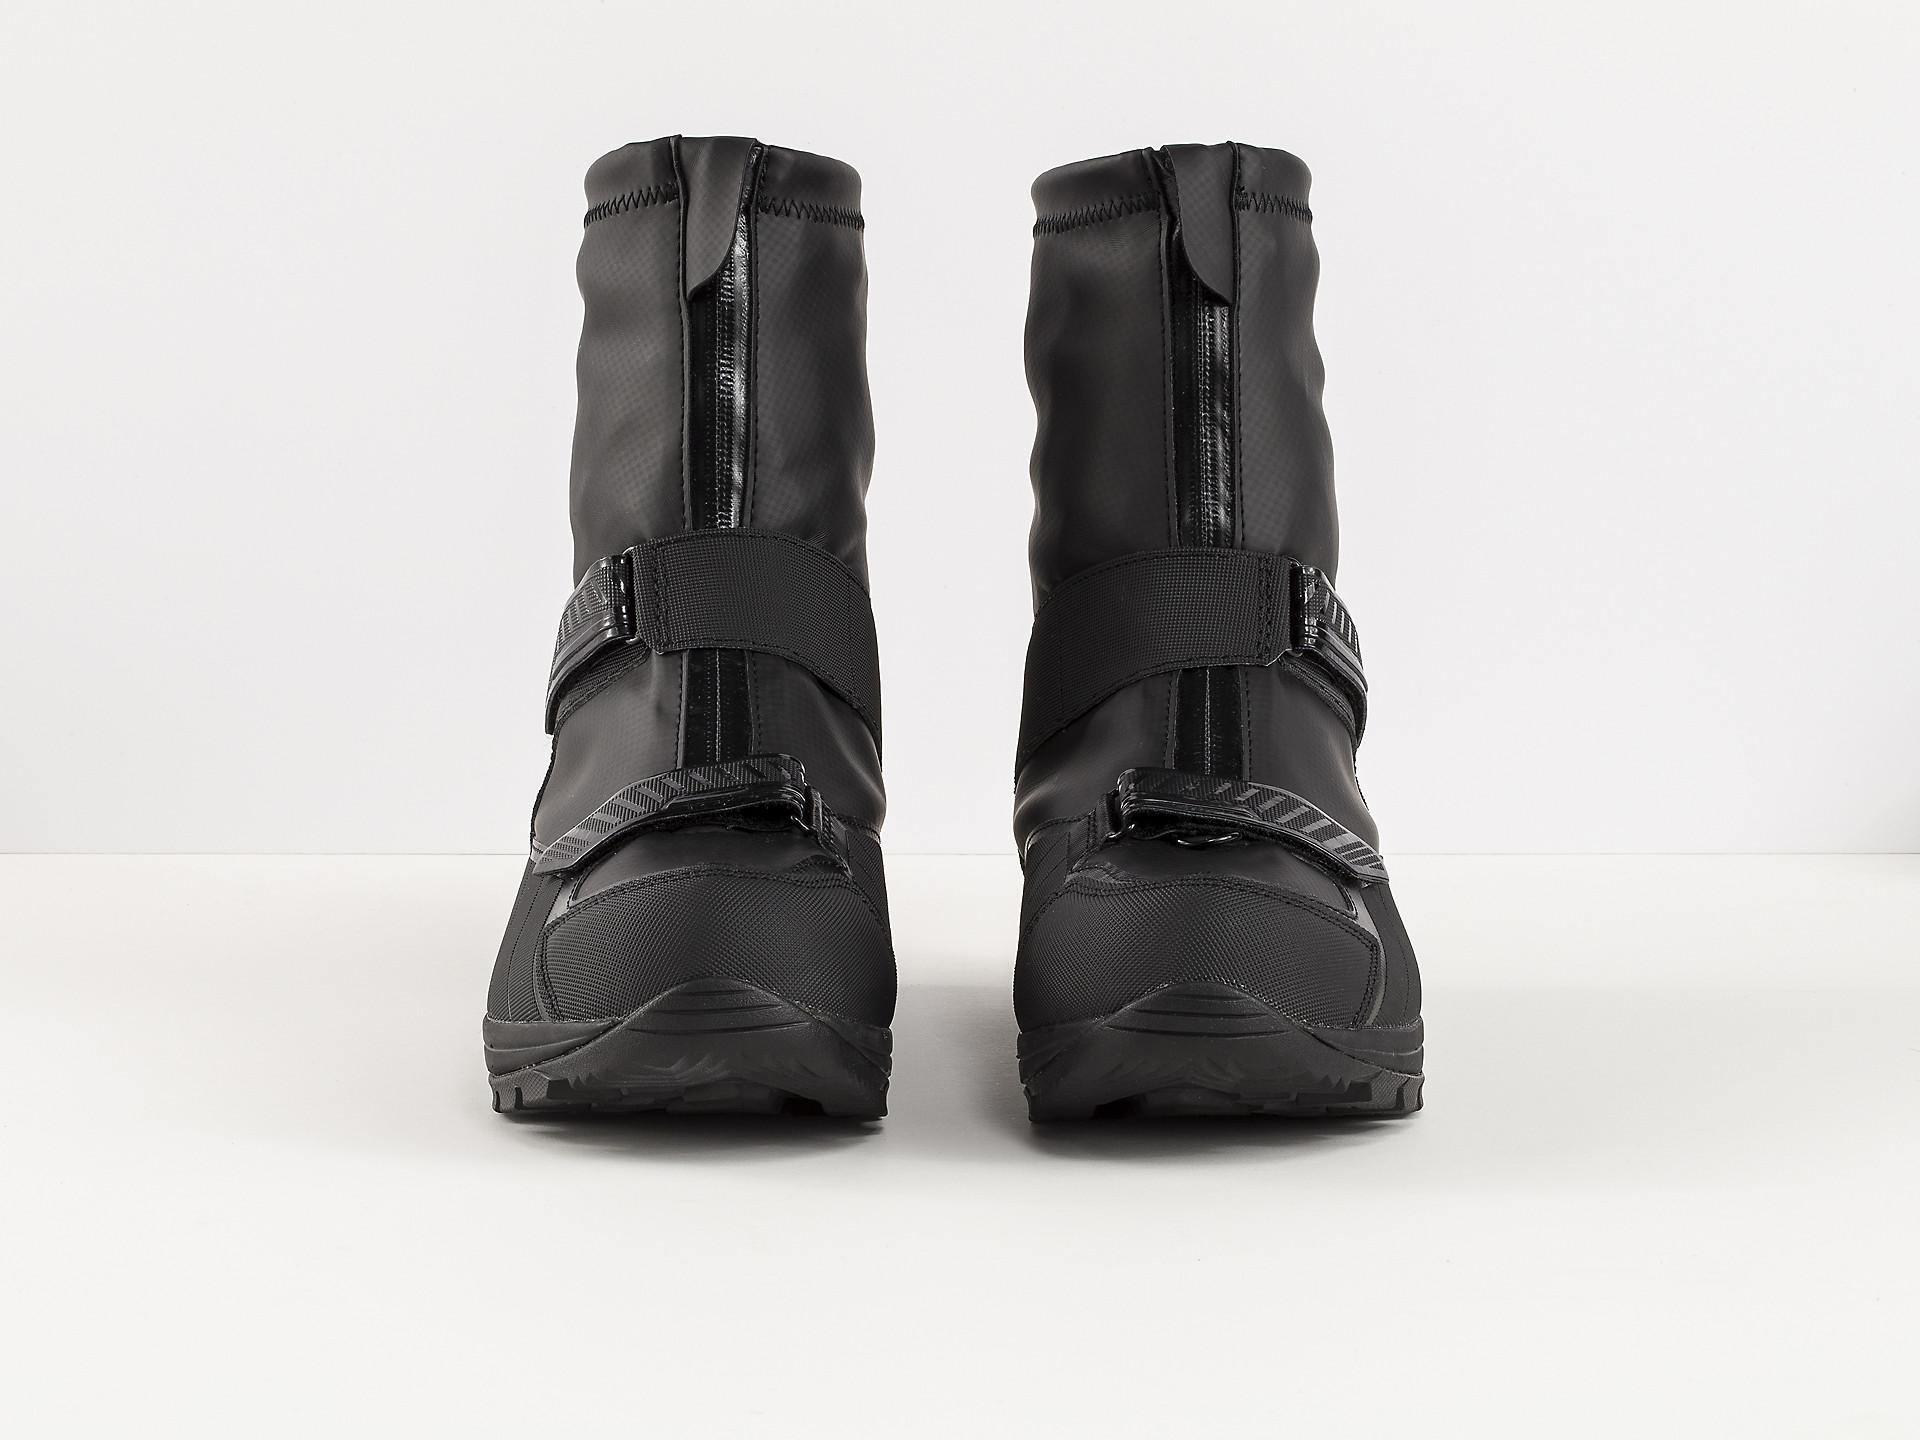 729df6a6e02 Bontrager OMW Winter Shoe